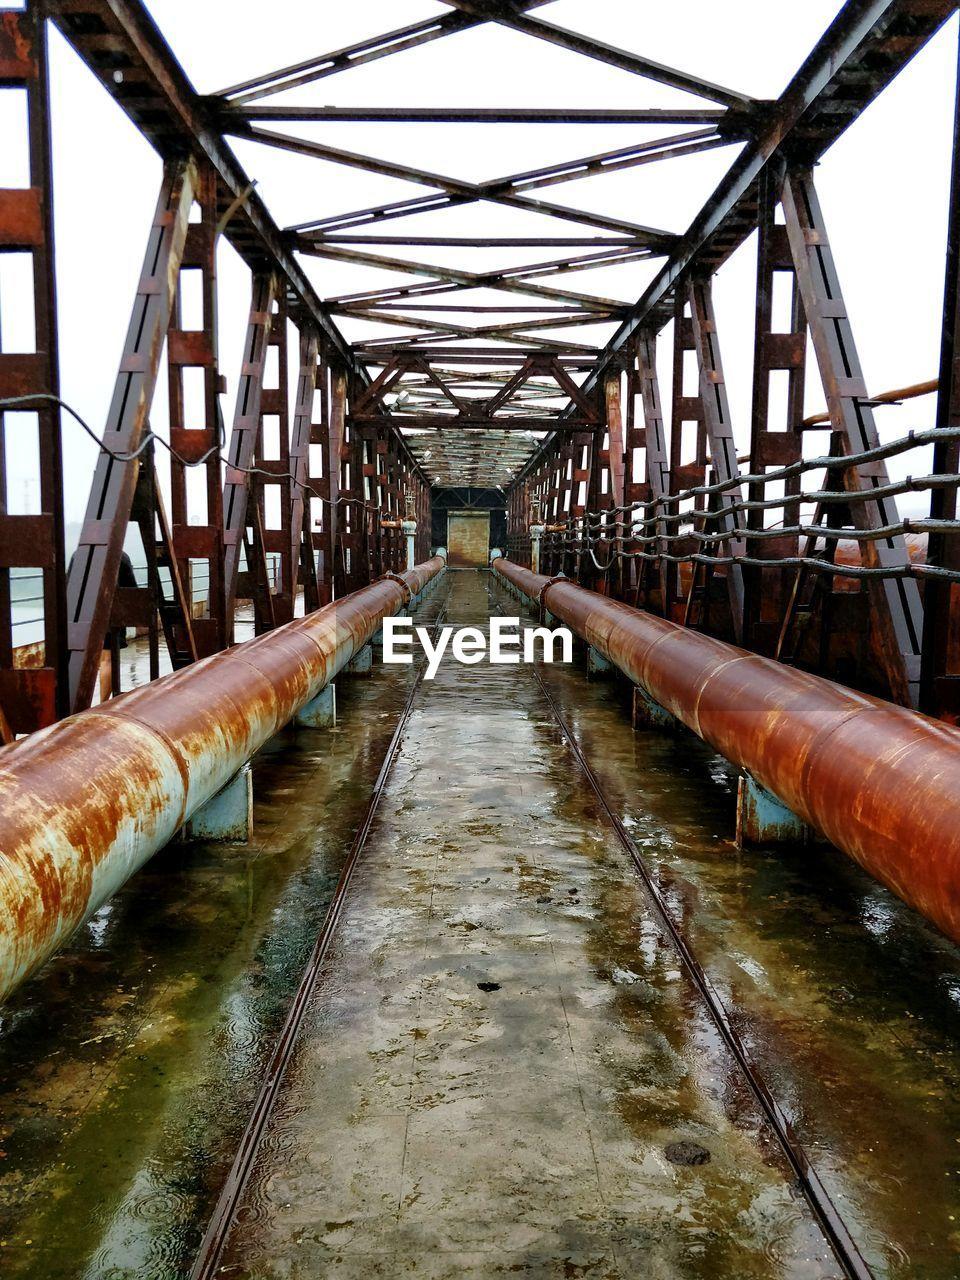 Pipes On Bridge